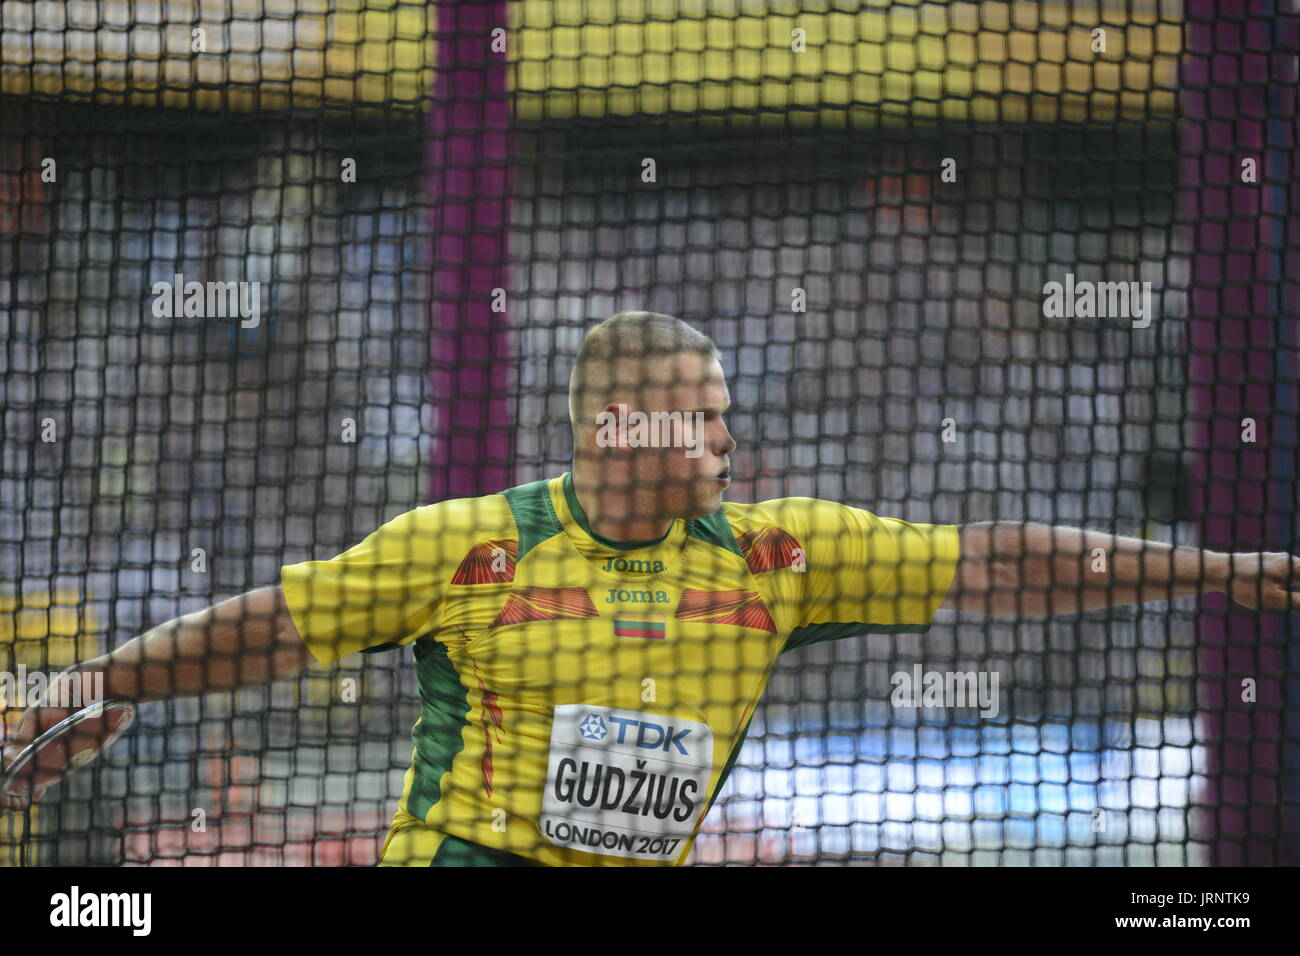 London, UK. 05th Aug, 2017. Andrius Gadzius,  Discus Throw, Lithuania, Athletics; IAAF World Championships Credit: - Stock Image